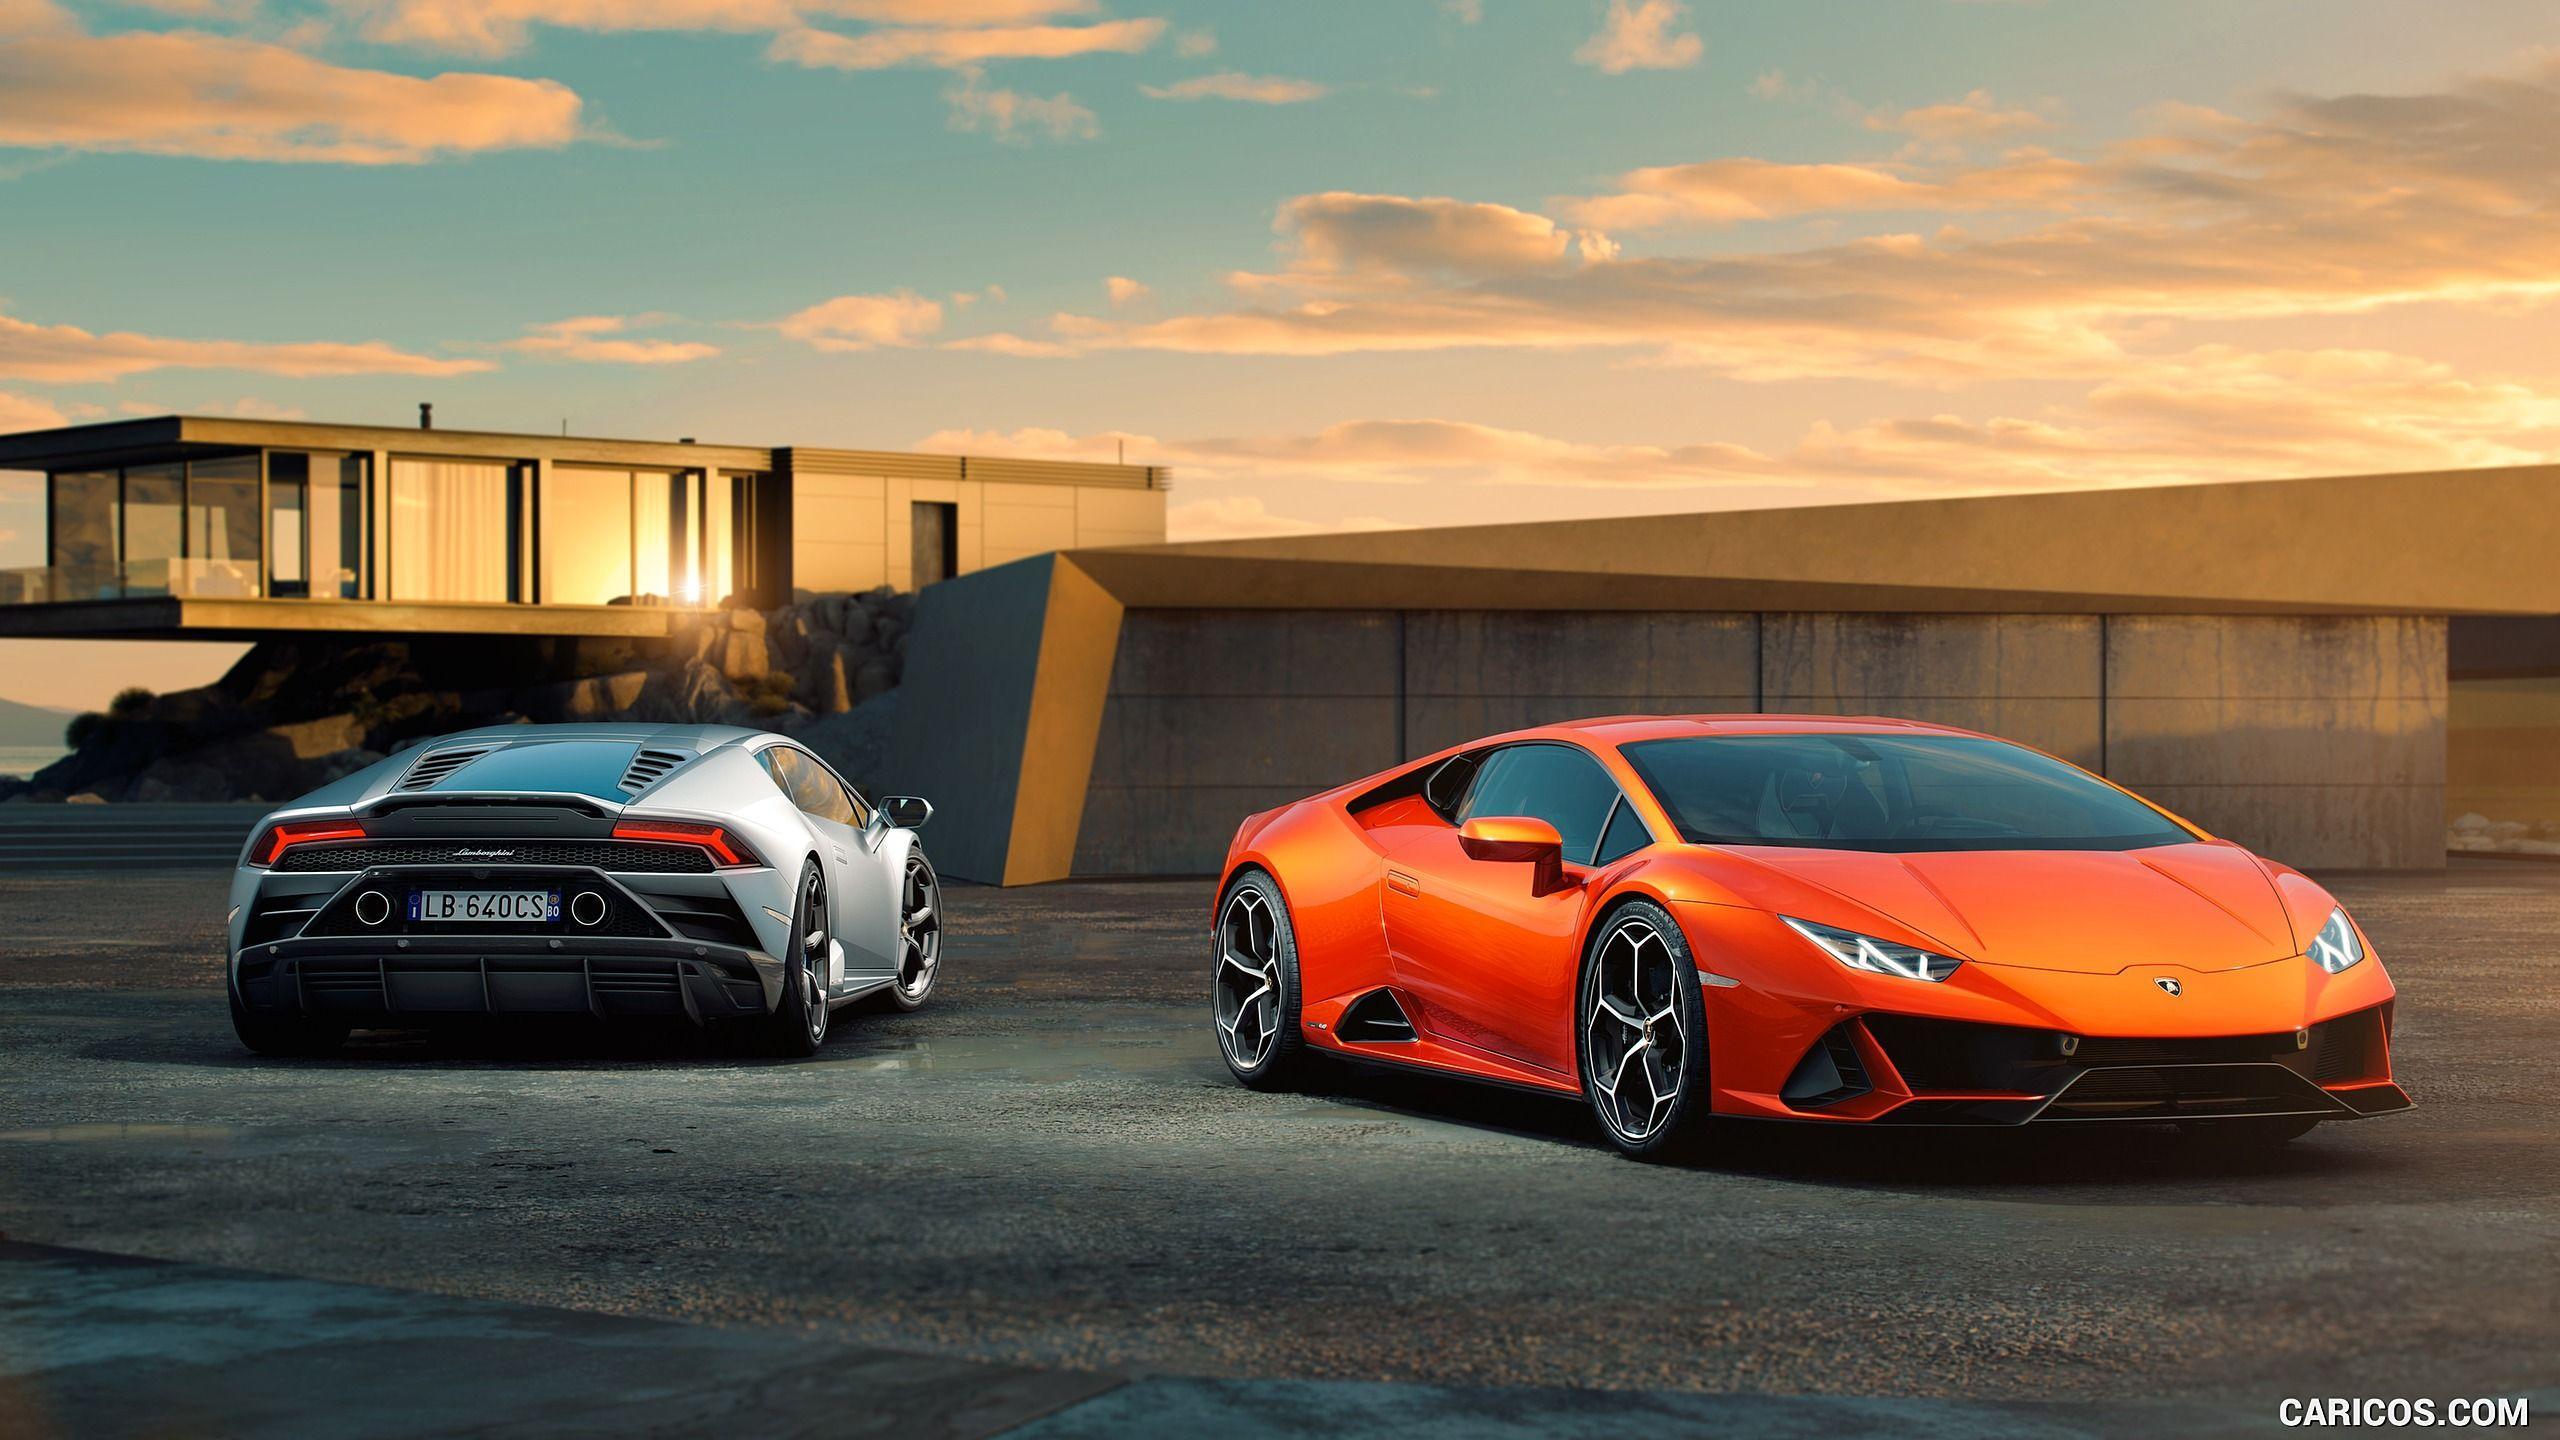 Lamborghini Huracan Hd Wallpapers Top Free Lamborghini Huracan Hd Backgrounds Wallpaperaccess